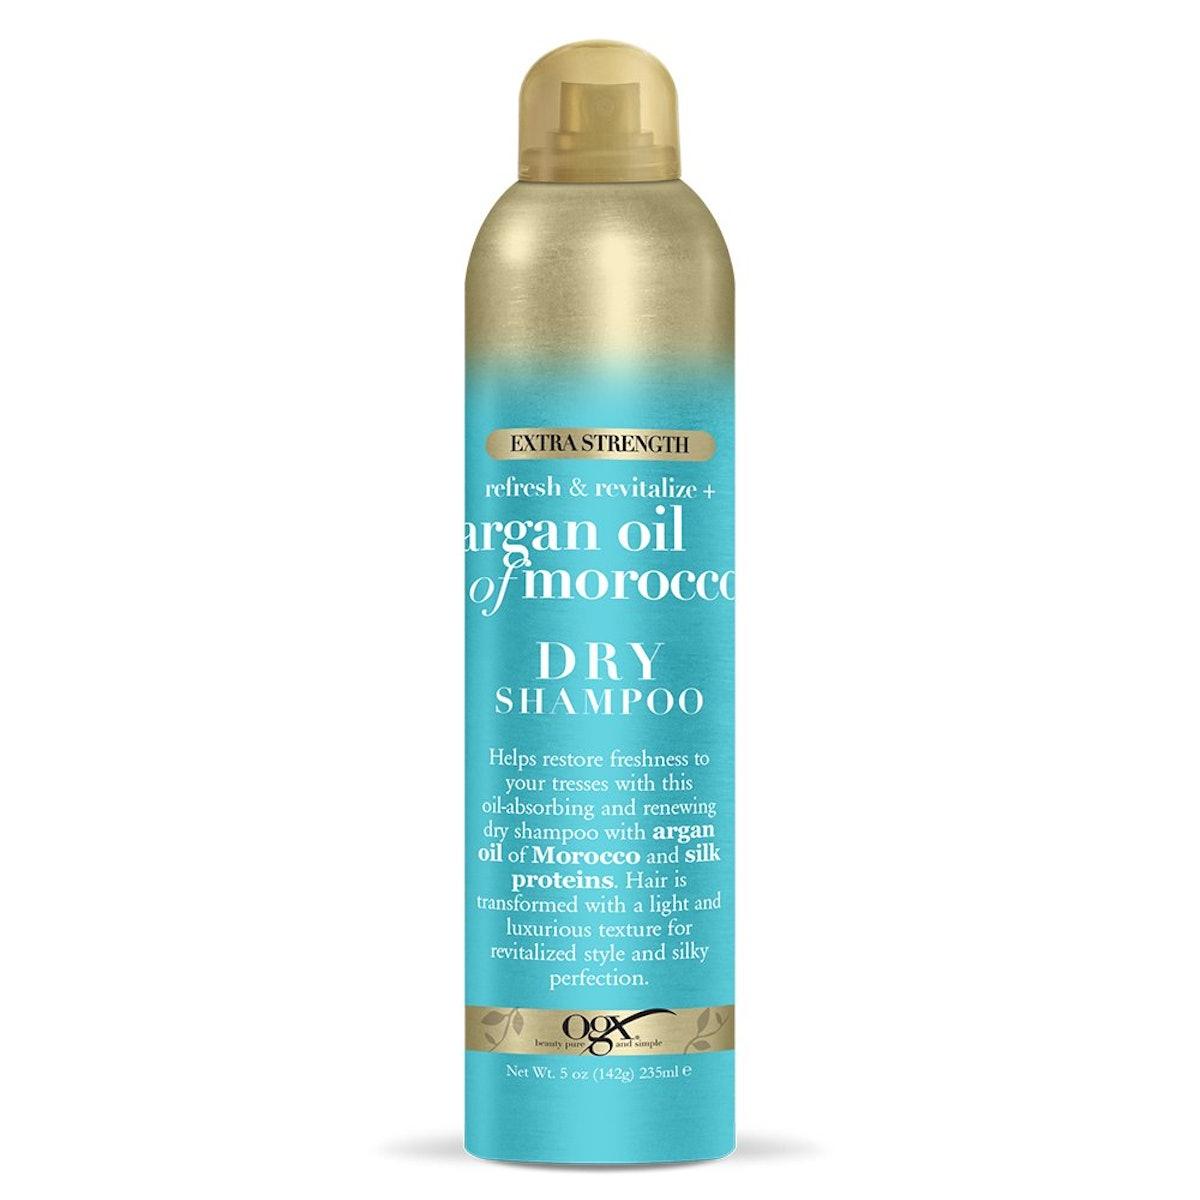 OGX Refresh & Revitalize Argan Oil Of Morocco Dry Shampoo